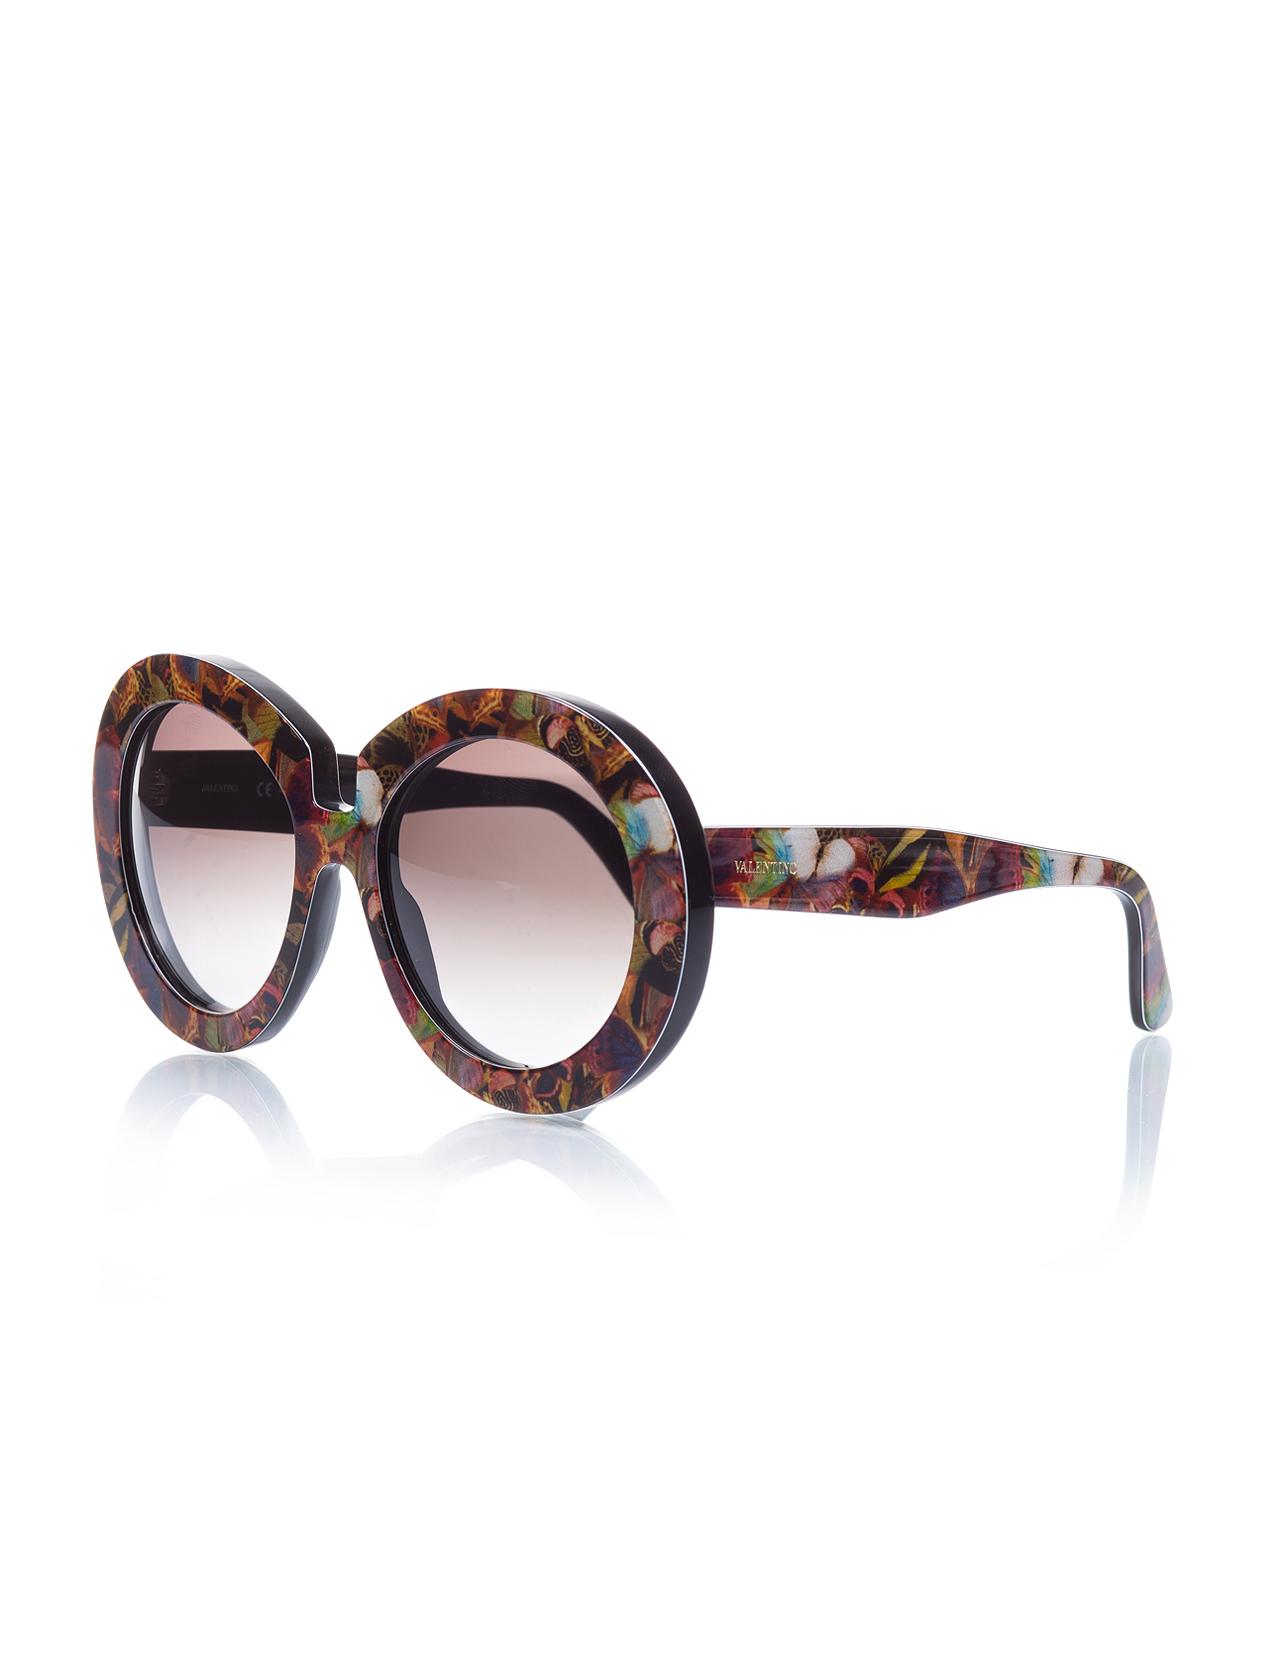 Women's sunglasses val 707 961 bone color organic round round 58-16-140 valentino